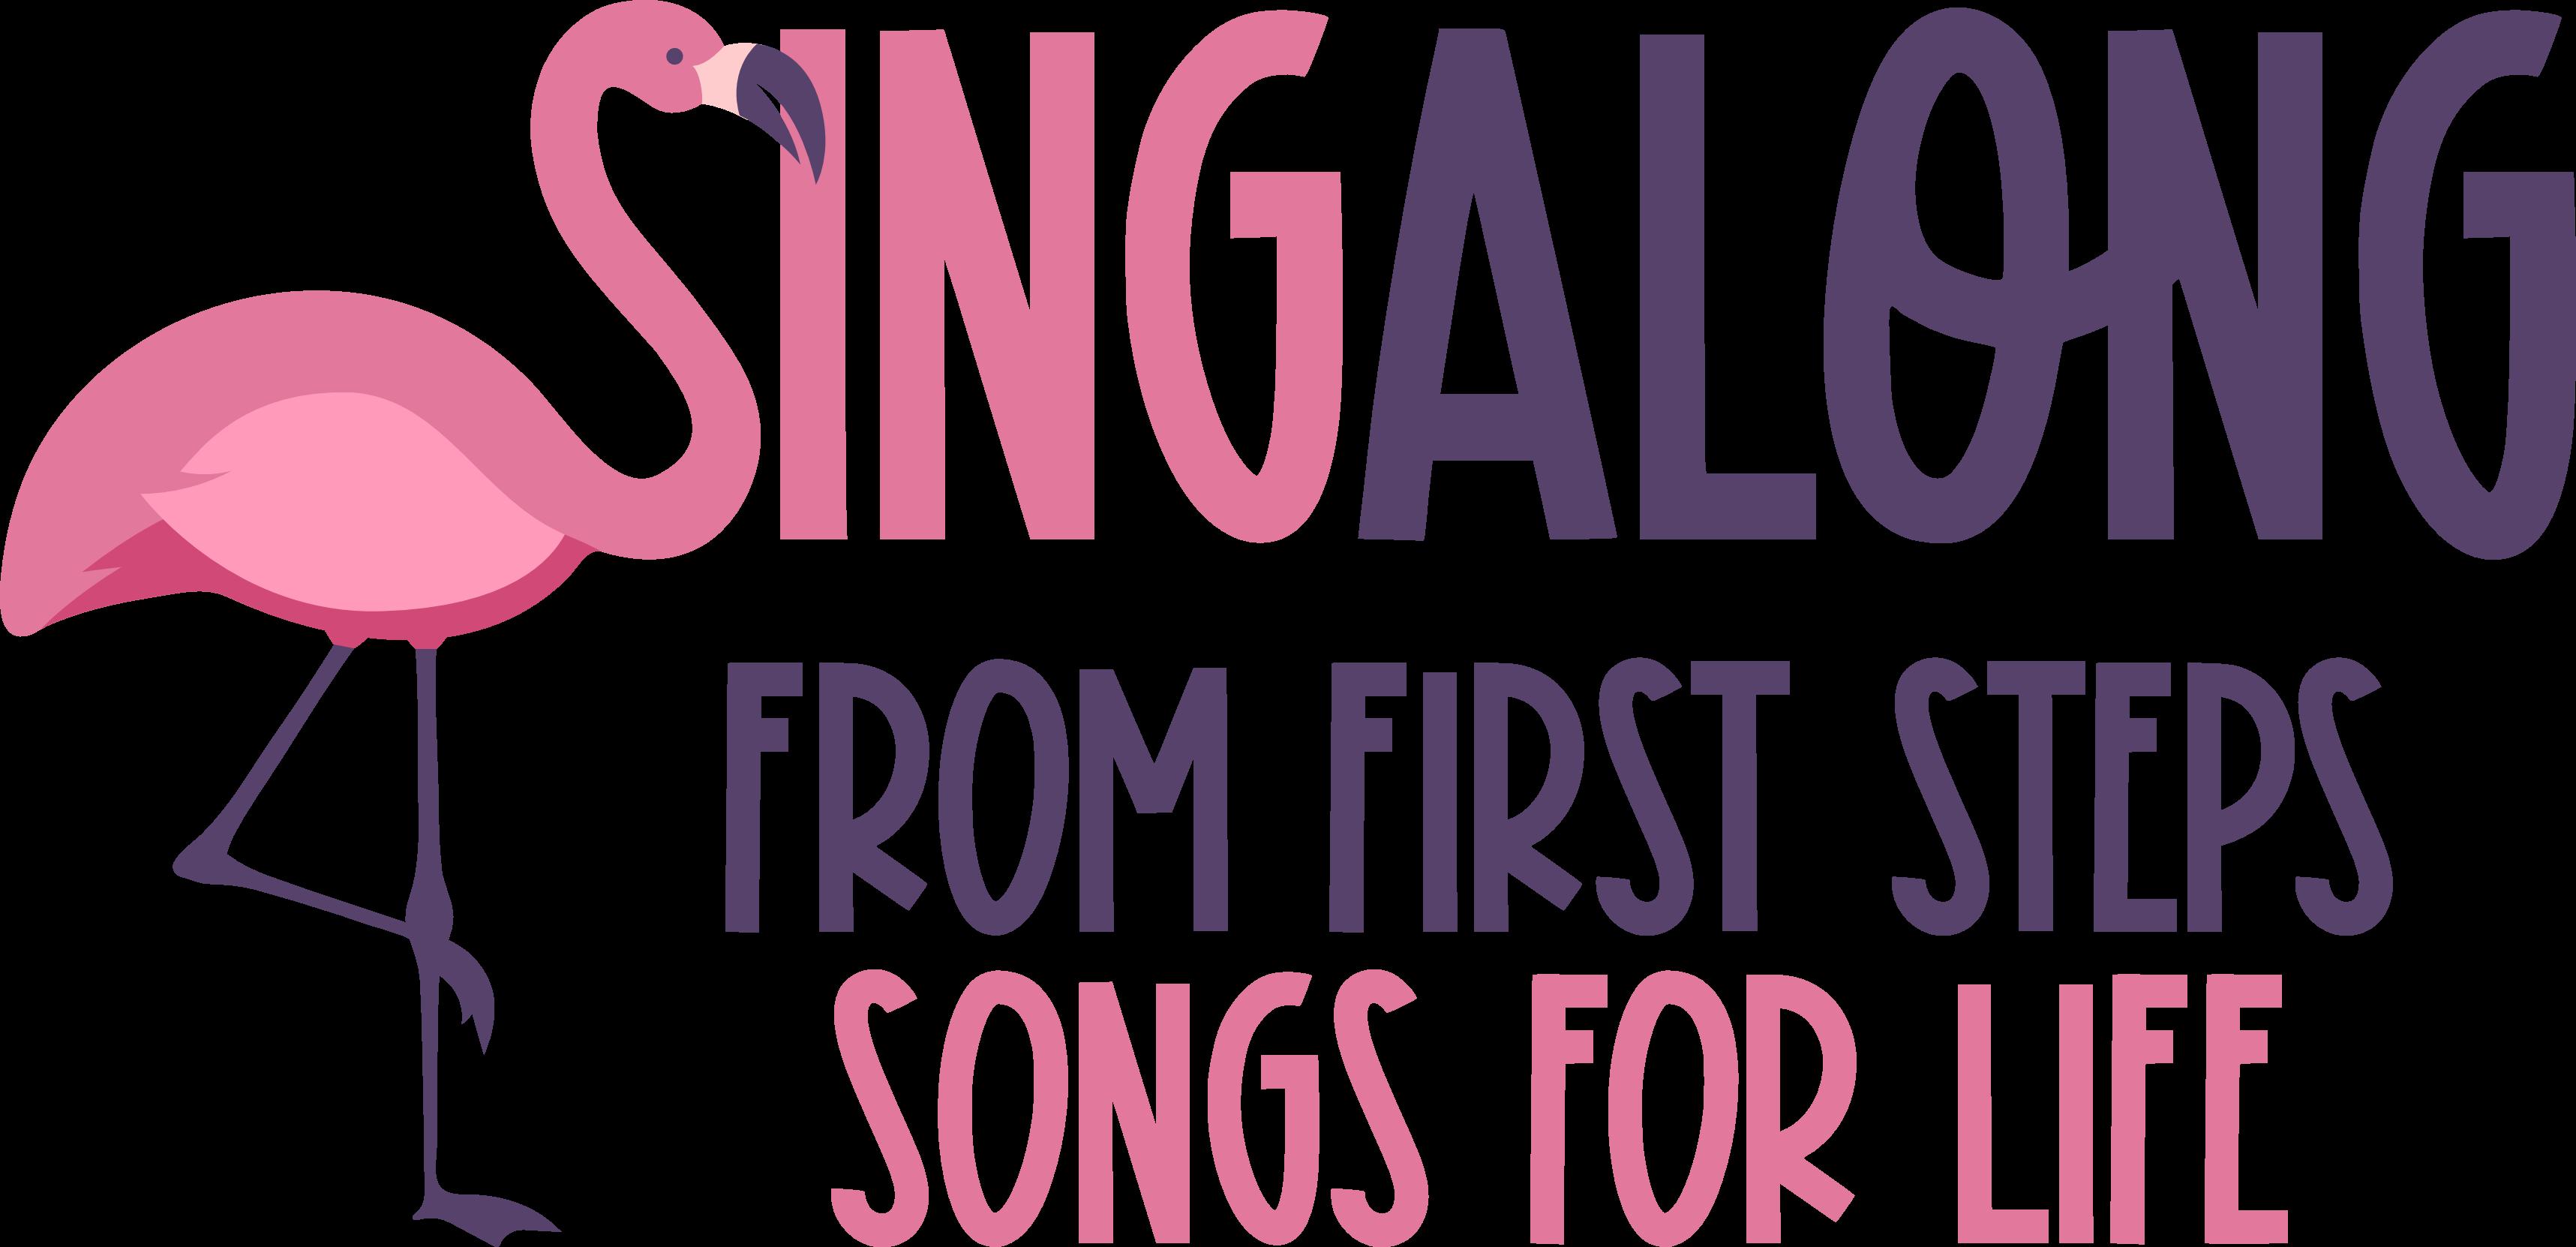 Singalong's logo